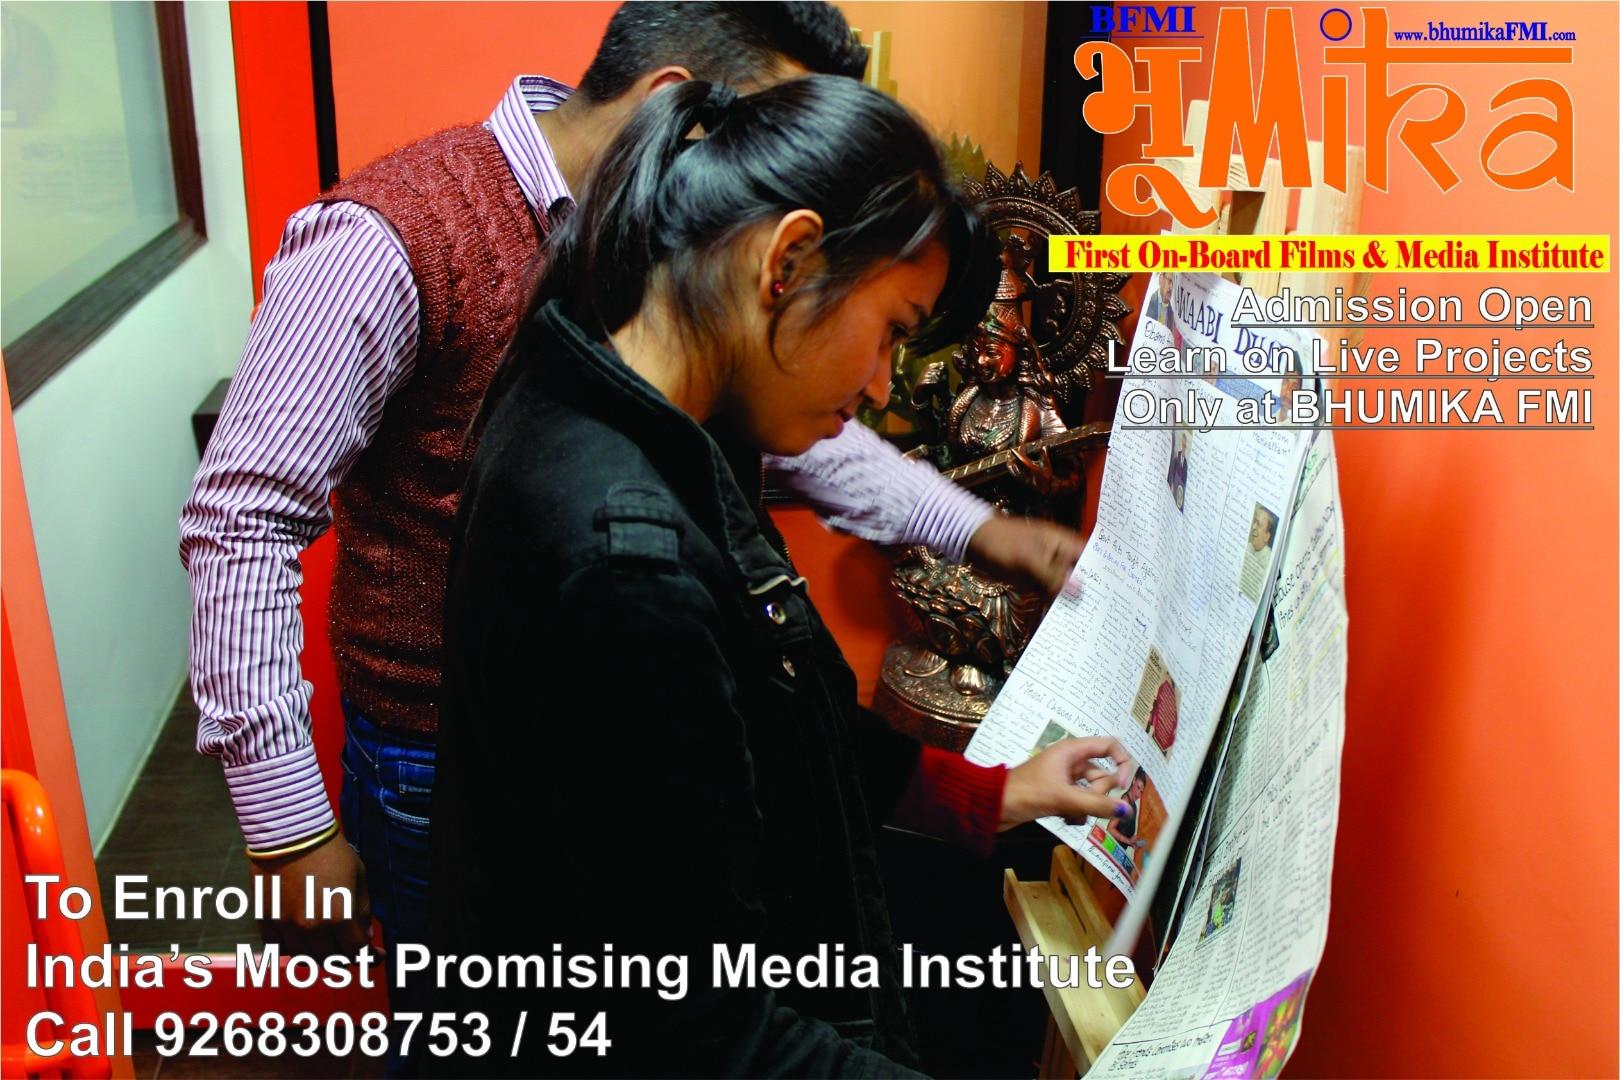 Bhumika Films And Media Institute